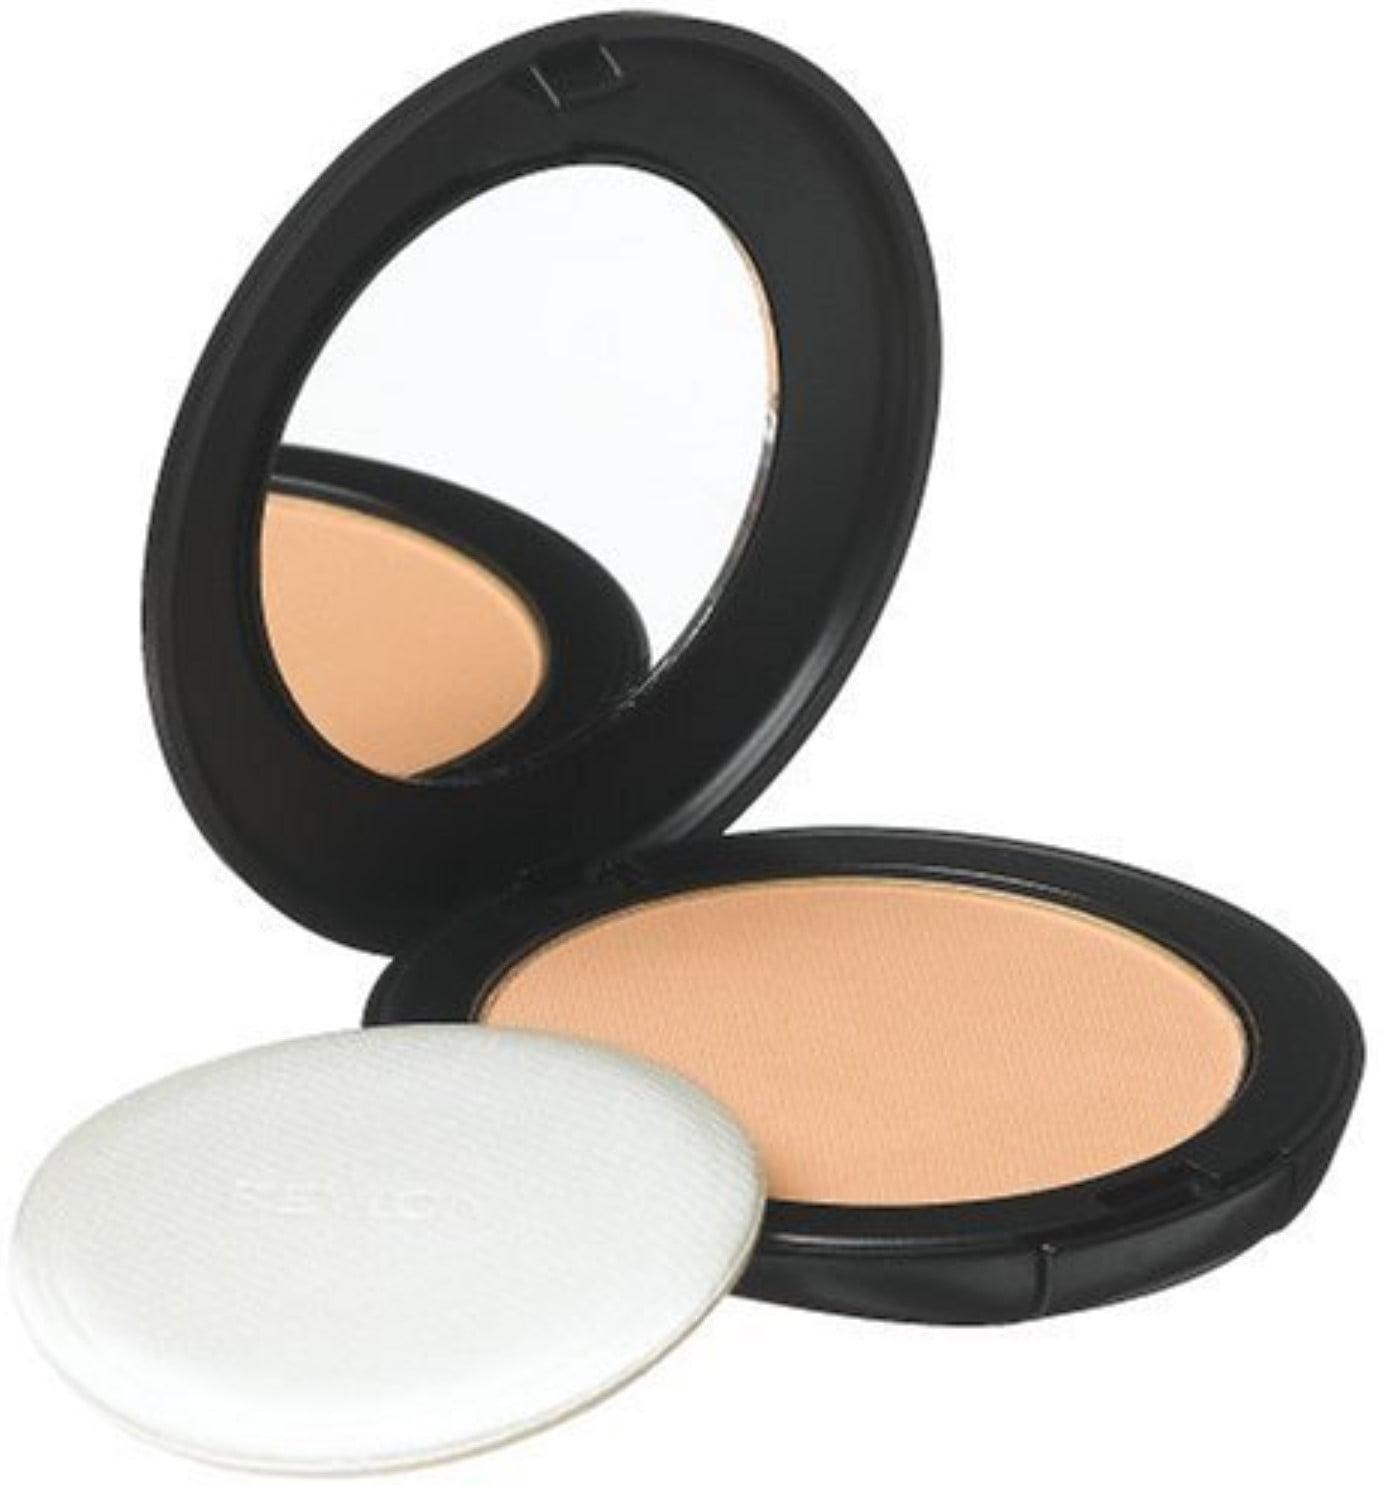 Revlon ColorStay Pressed Powder, Medium/Deep, 0.3 oz